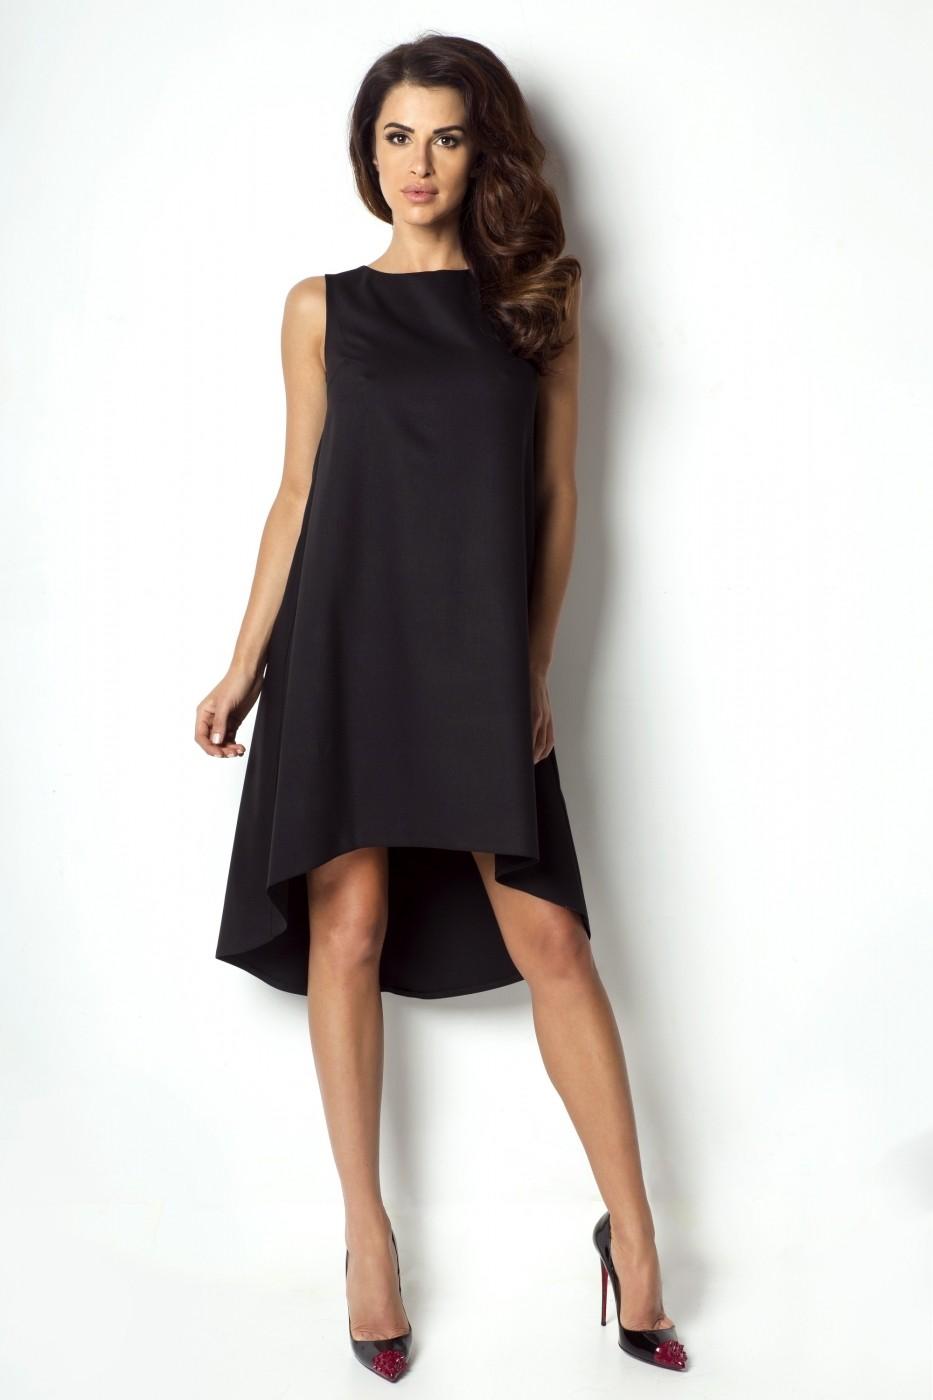 07e9df8444 IVON Estélyi ruha GLB-P2_BLACK_els Fekete - FashionUP!